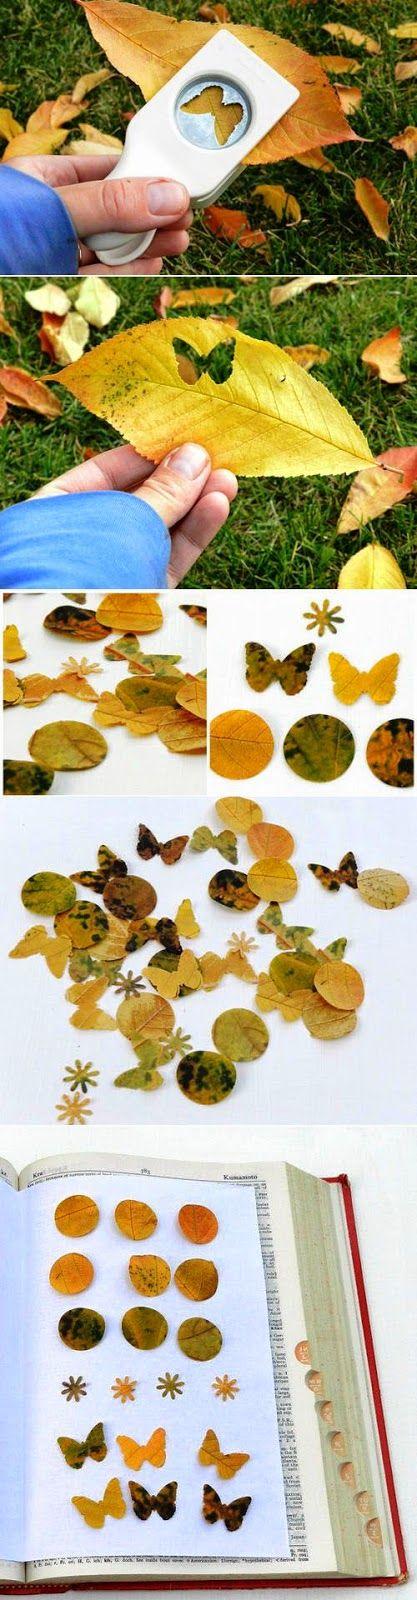 Make leaf art